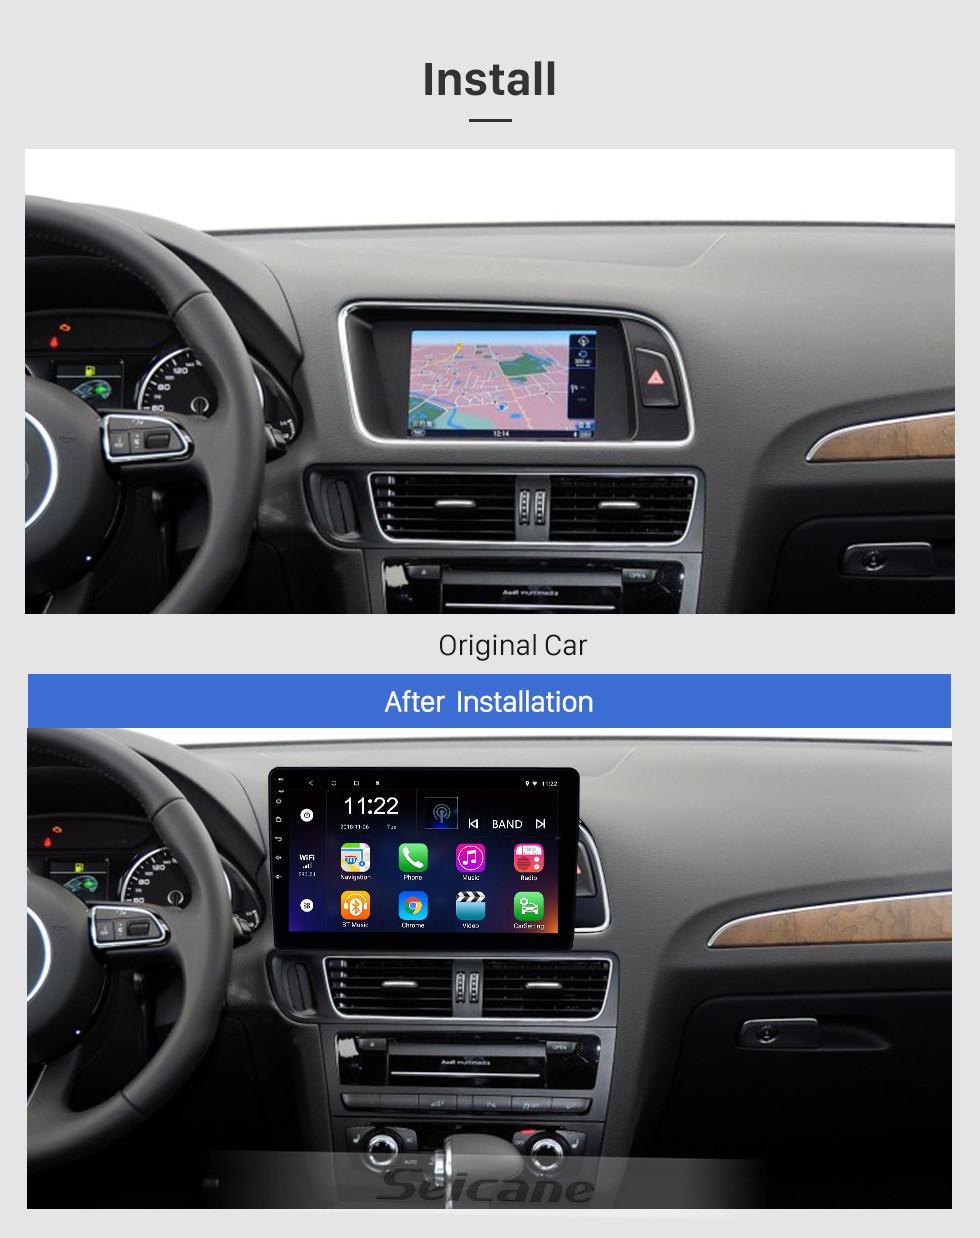 Seicane 10,1-дюймовый Android 10.0 GPS-навигатор HD с сенсорным радио для 2010-2017 Audi Q5 с Bluetooth USB WIFI AUX с поддержкой DVR SWC 3G Carplay Камера заднего вида OBD